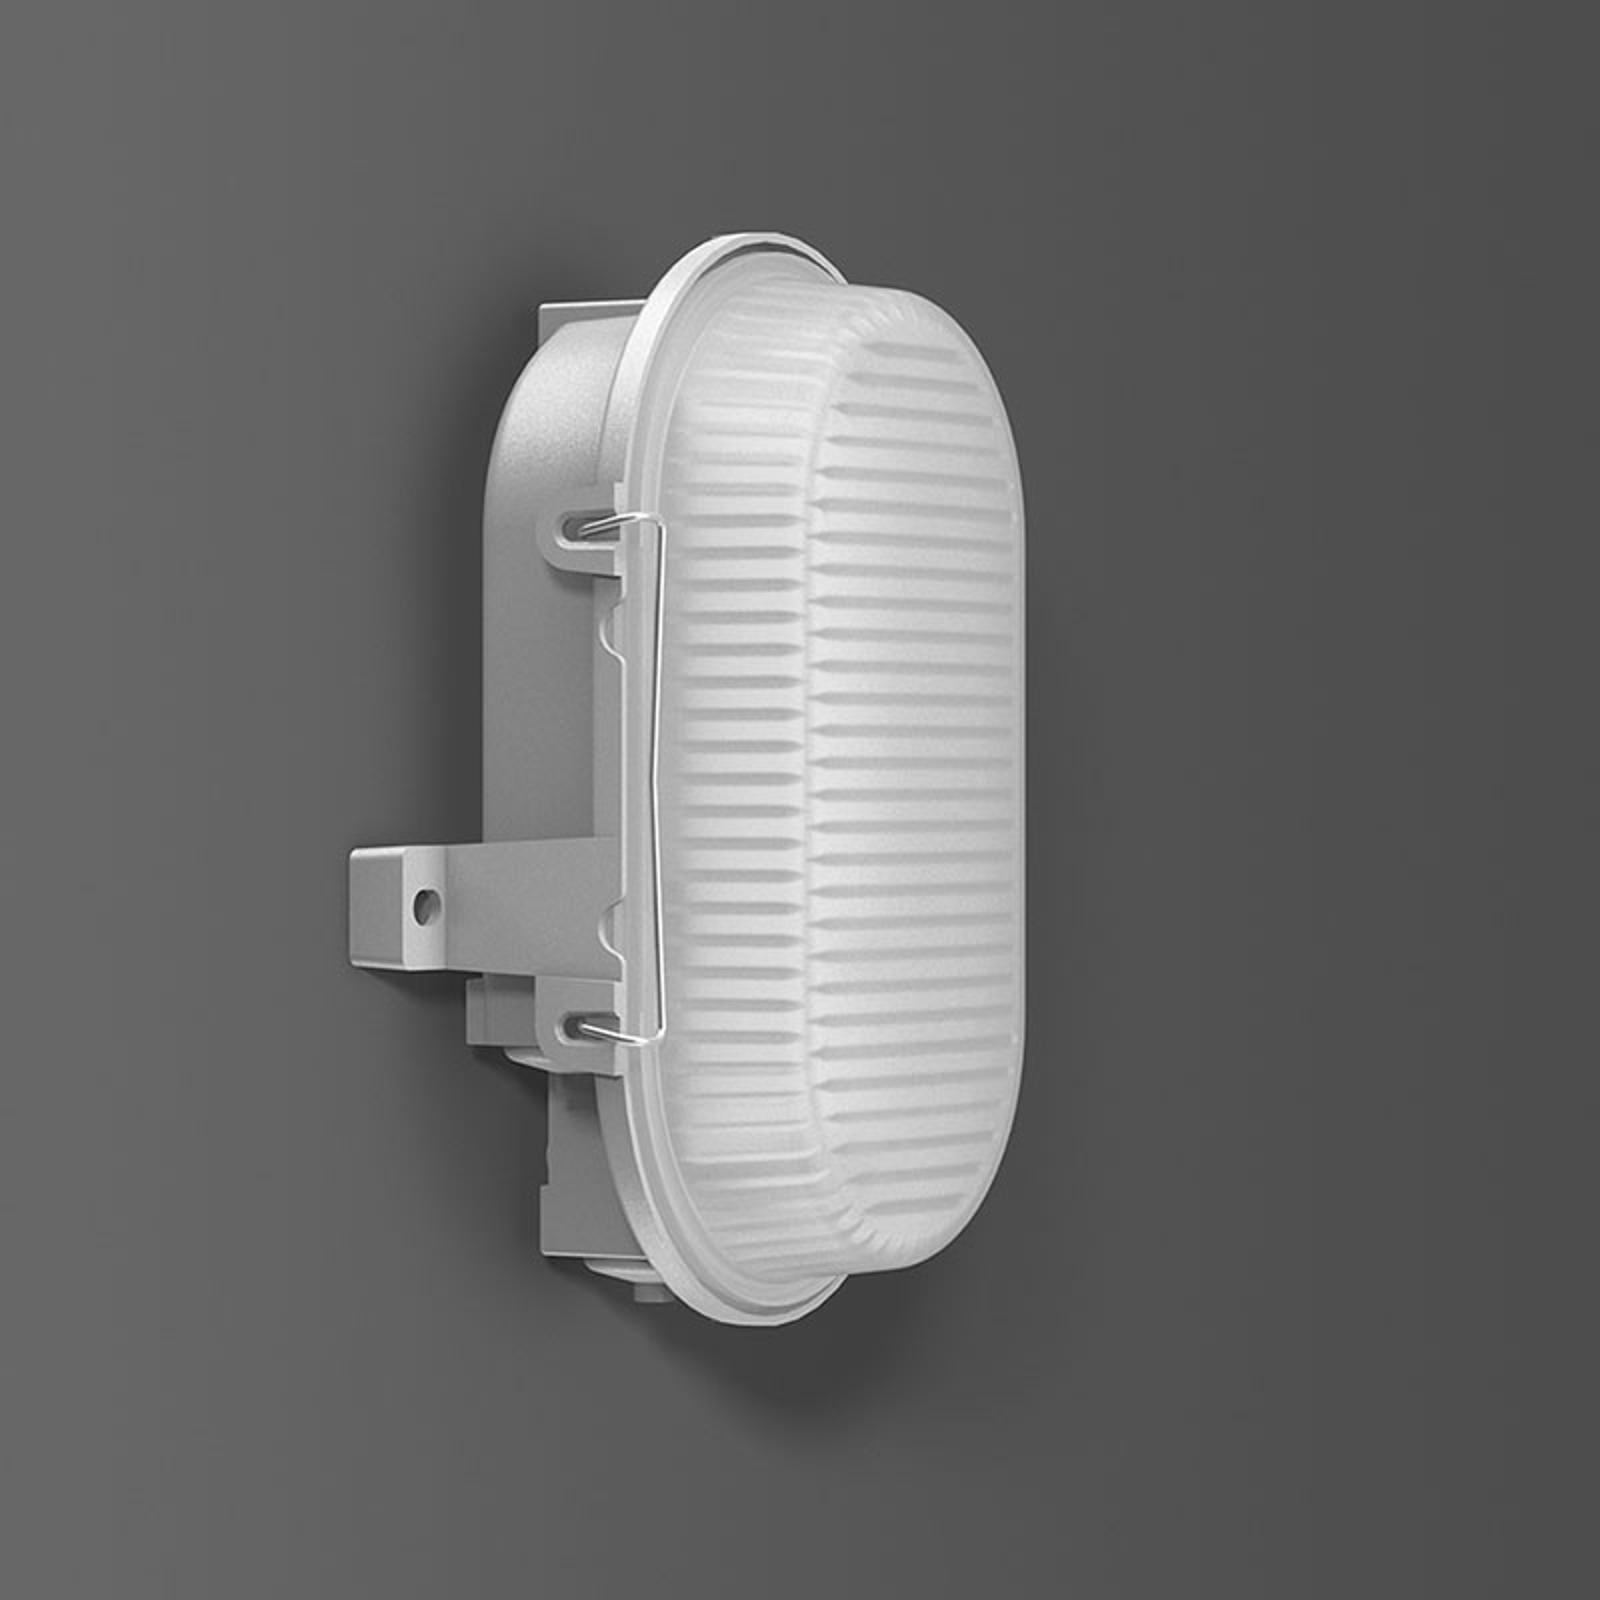 RZB Alu-Standard LED-Wandleuchte, oval, IP66